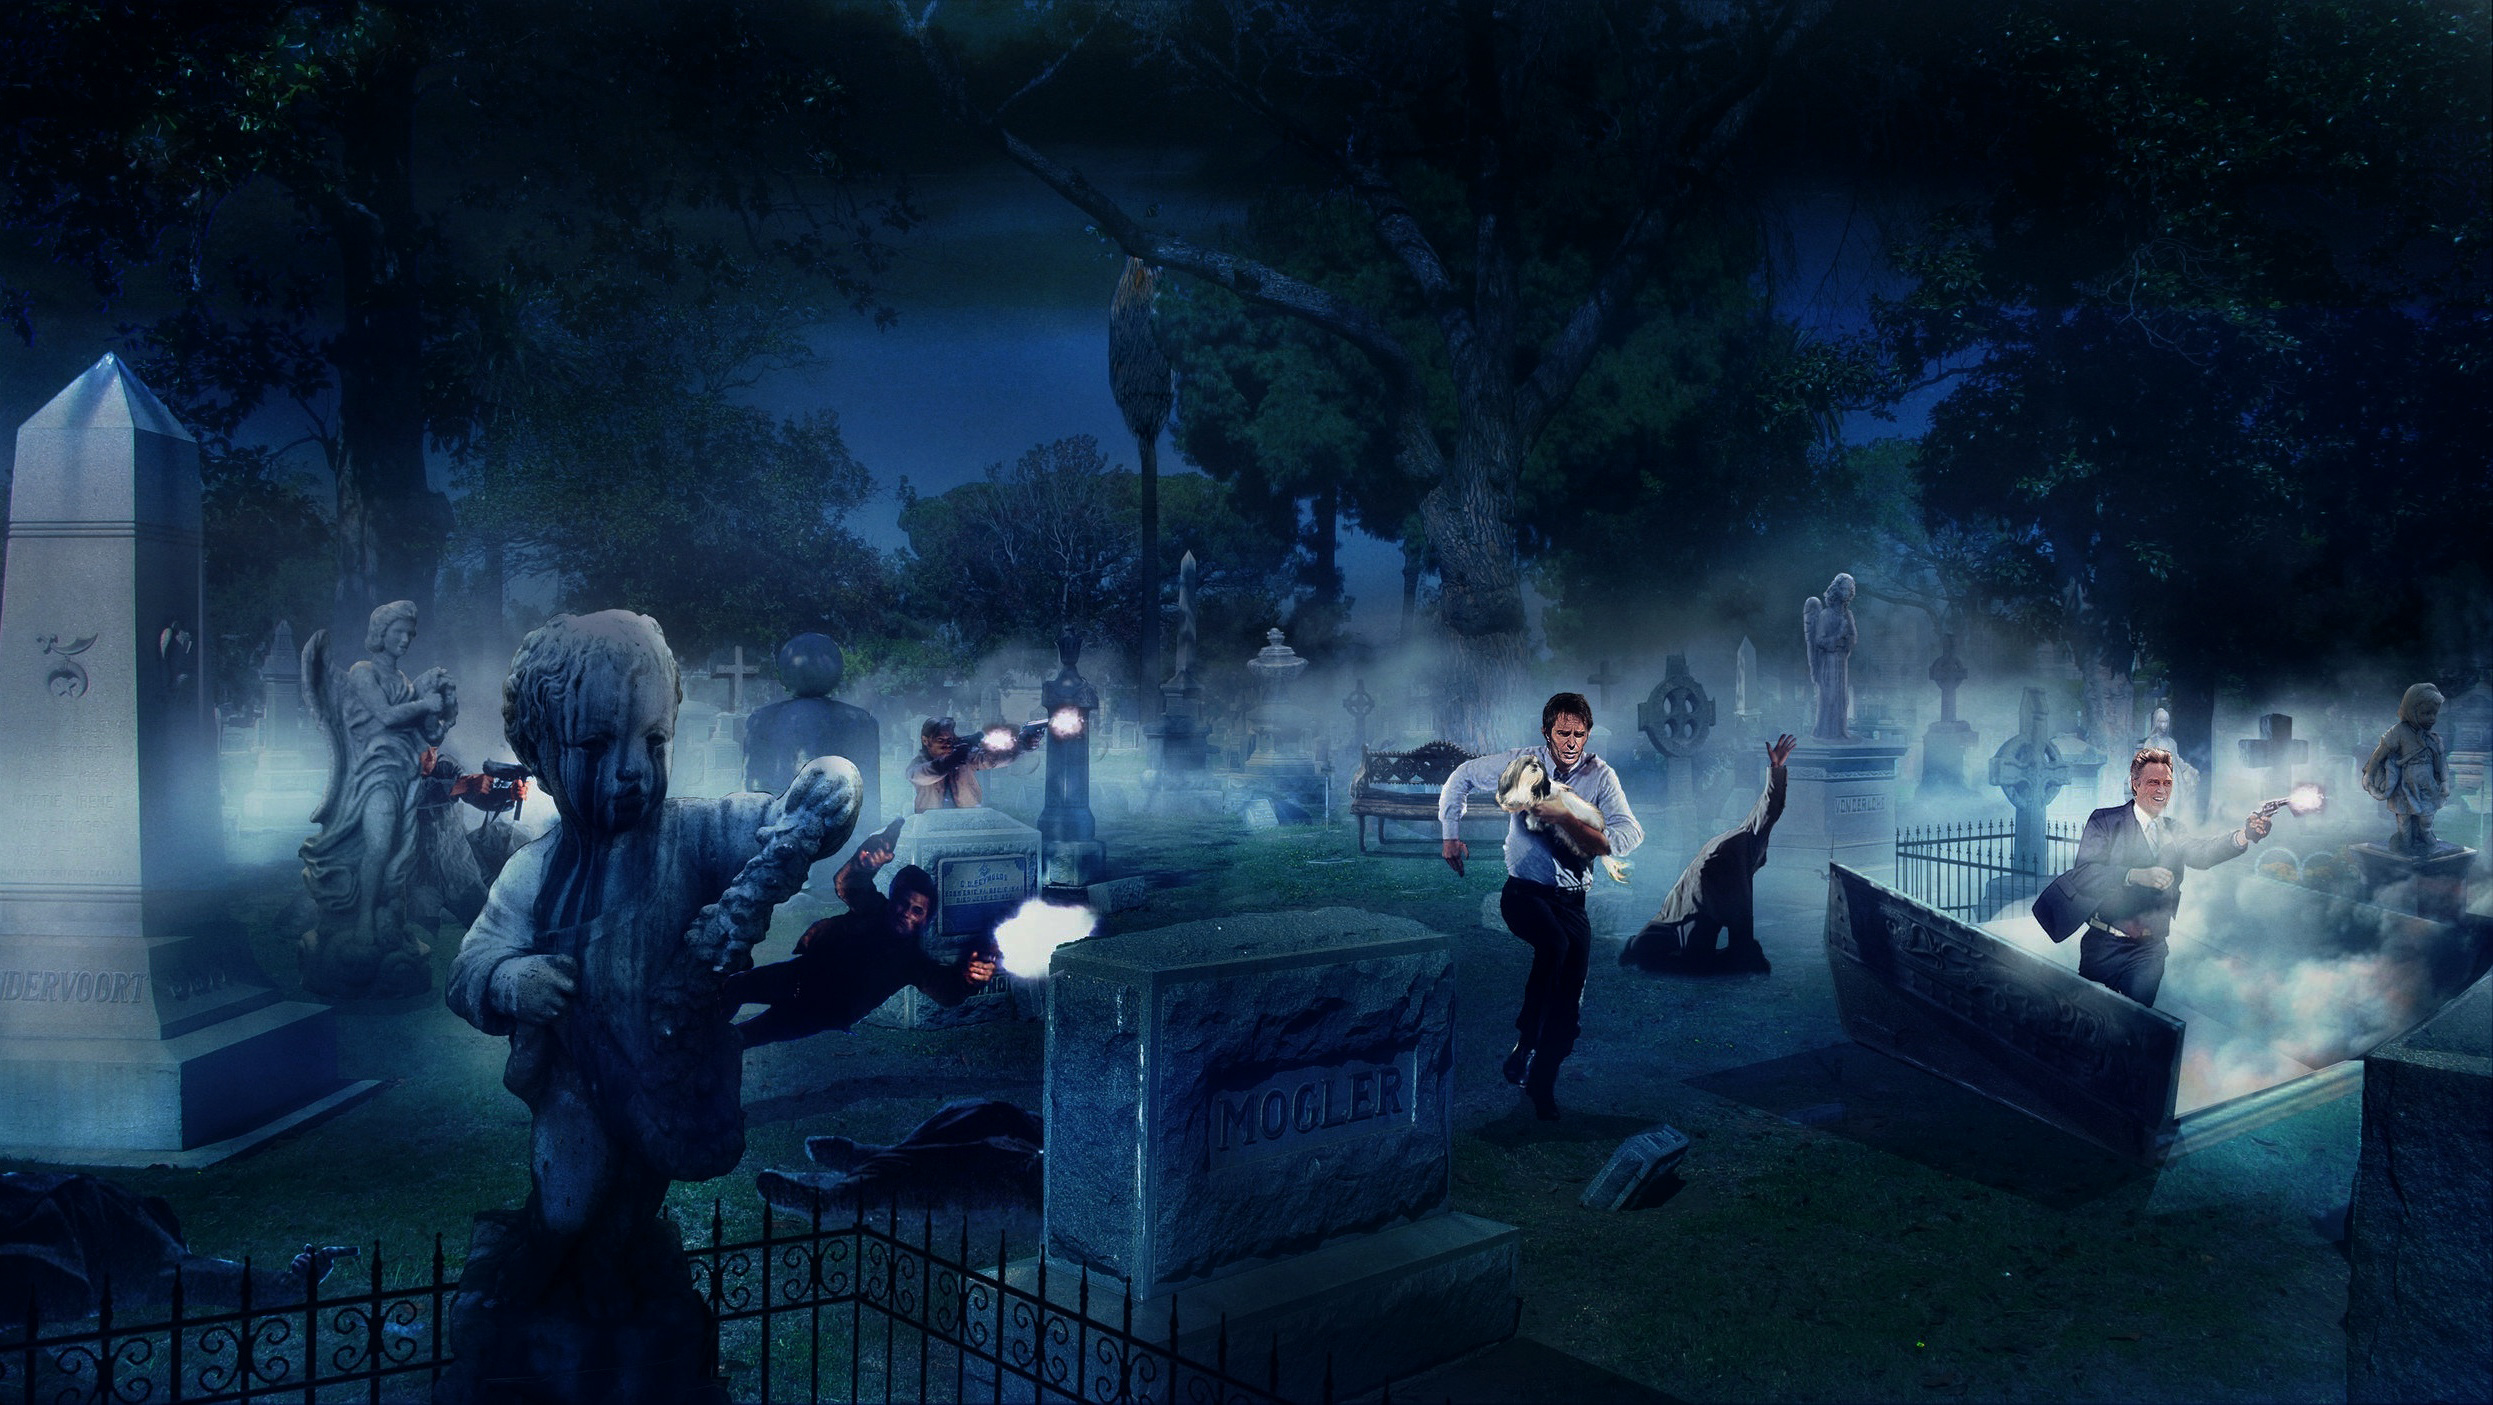 cemeteryblowout.jpg